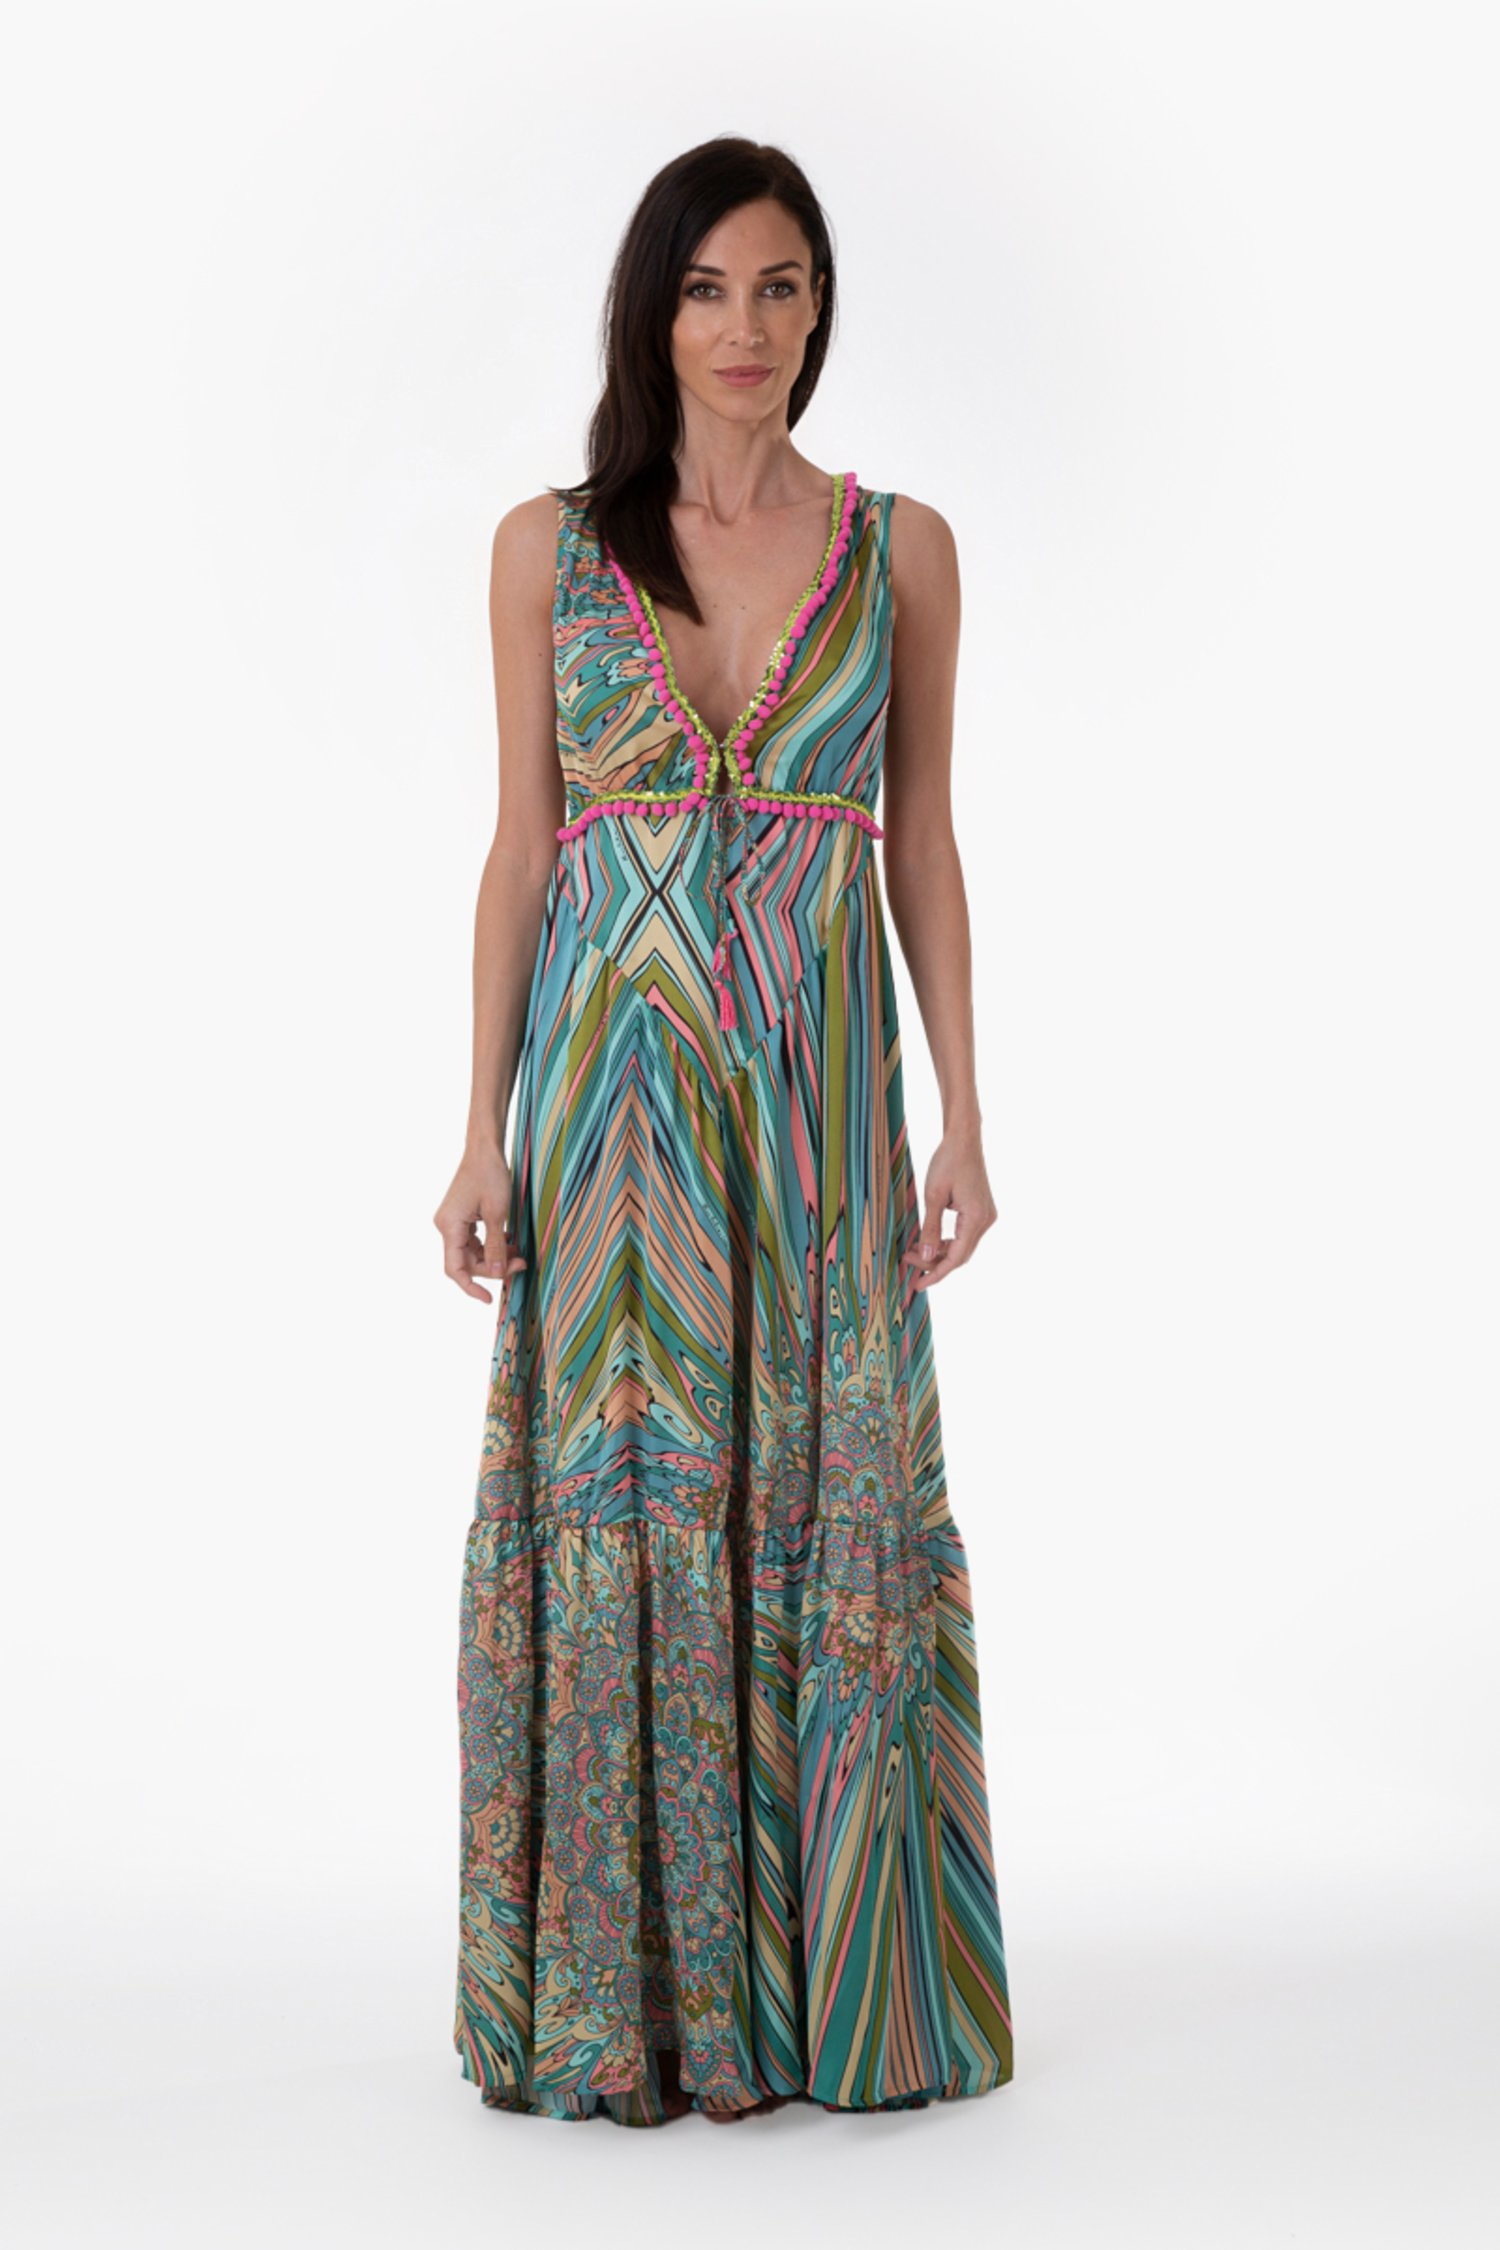 PRINTED SATIN LONG DRESS WITH TRIMMING - Mandala Azzurro